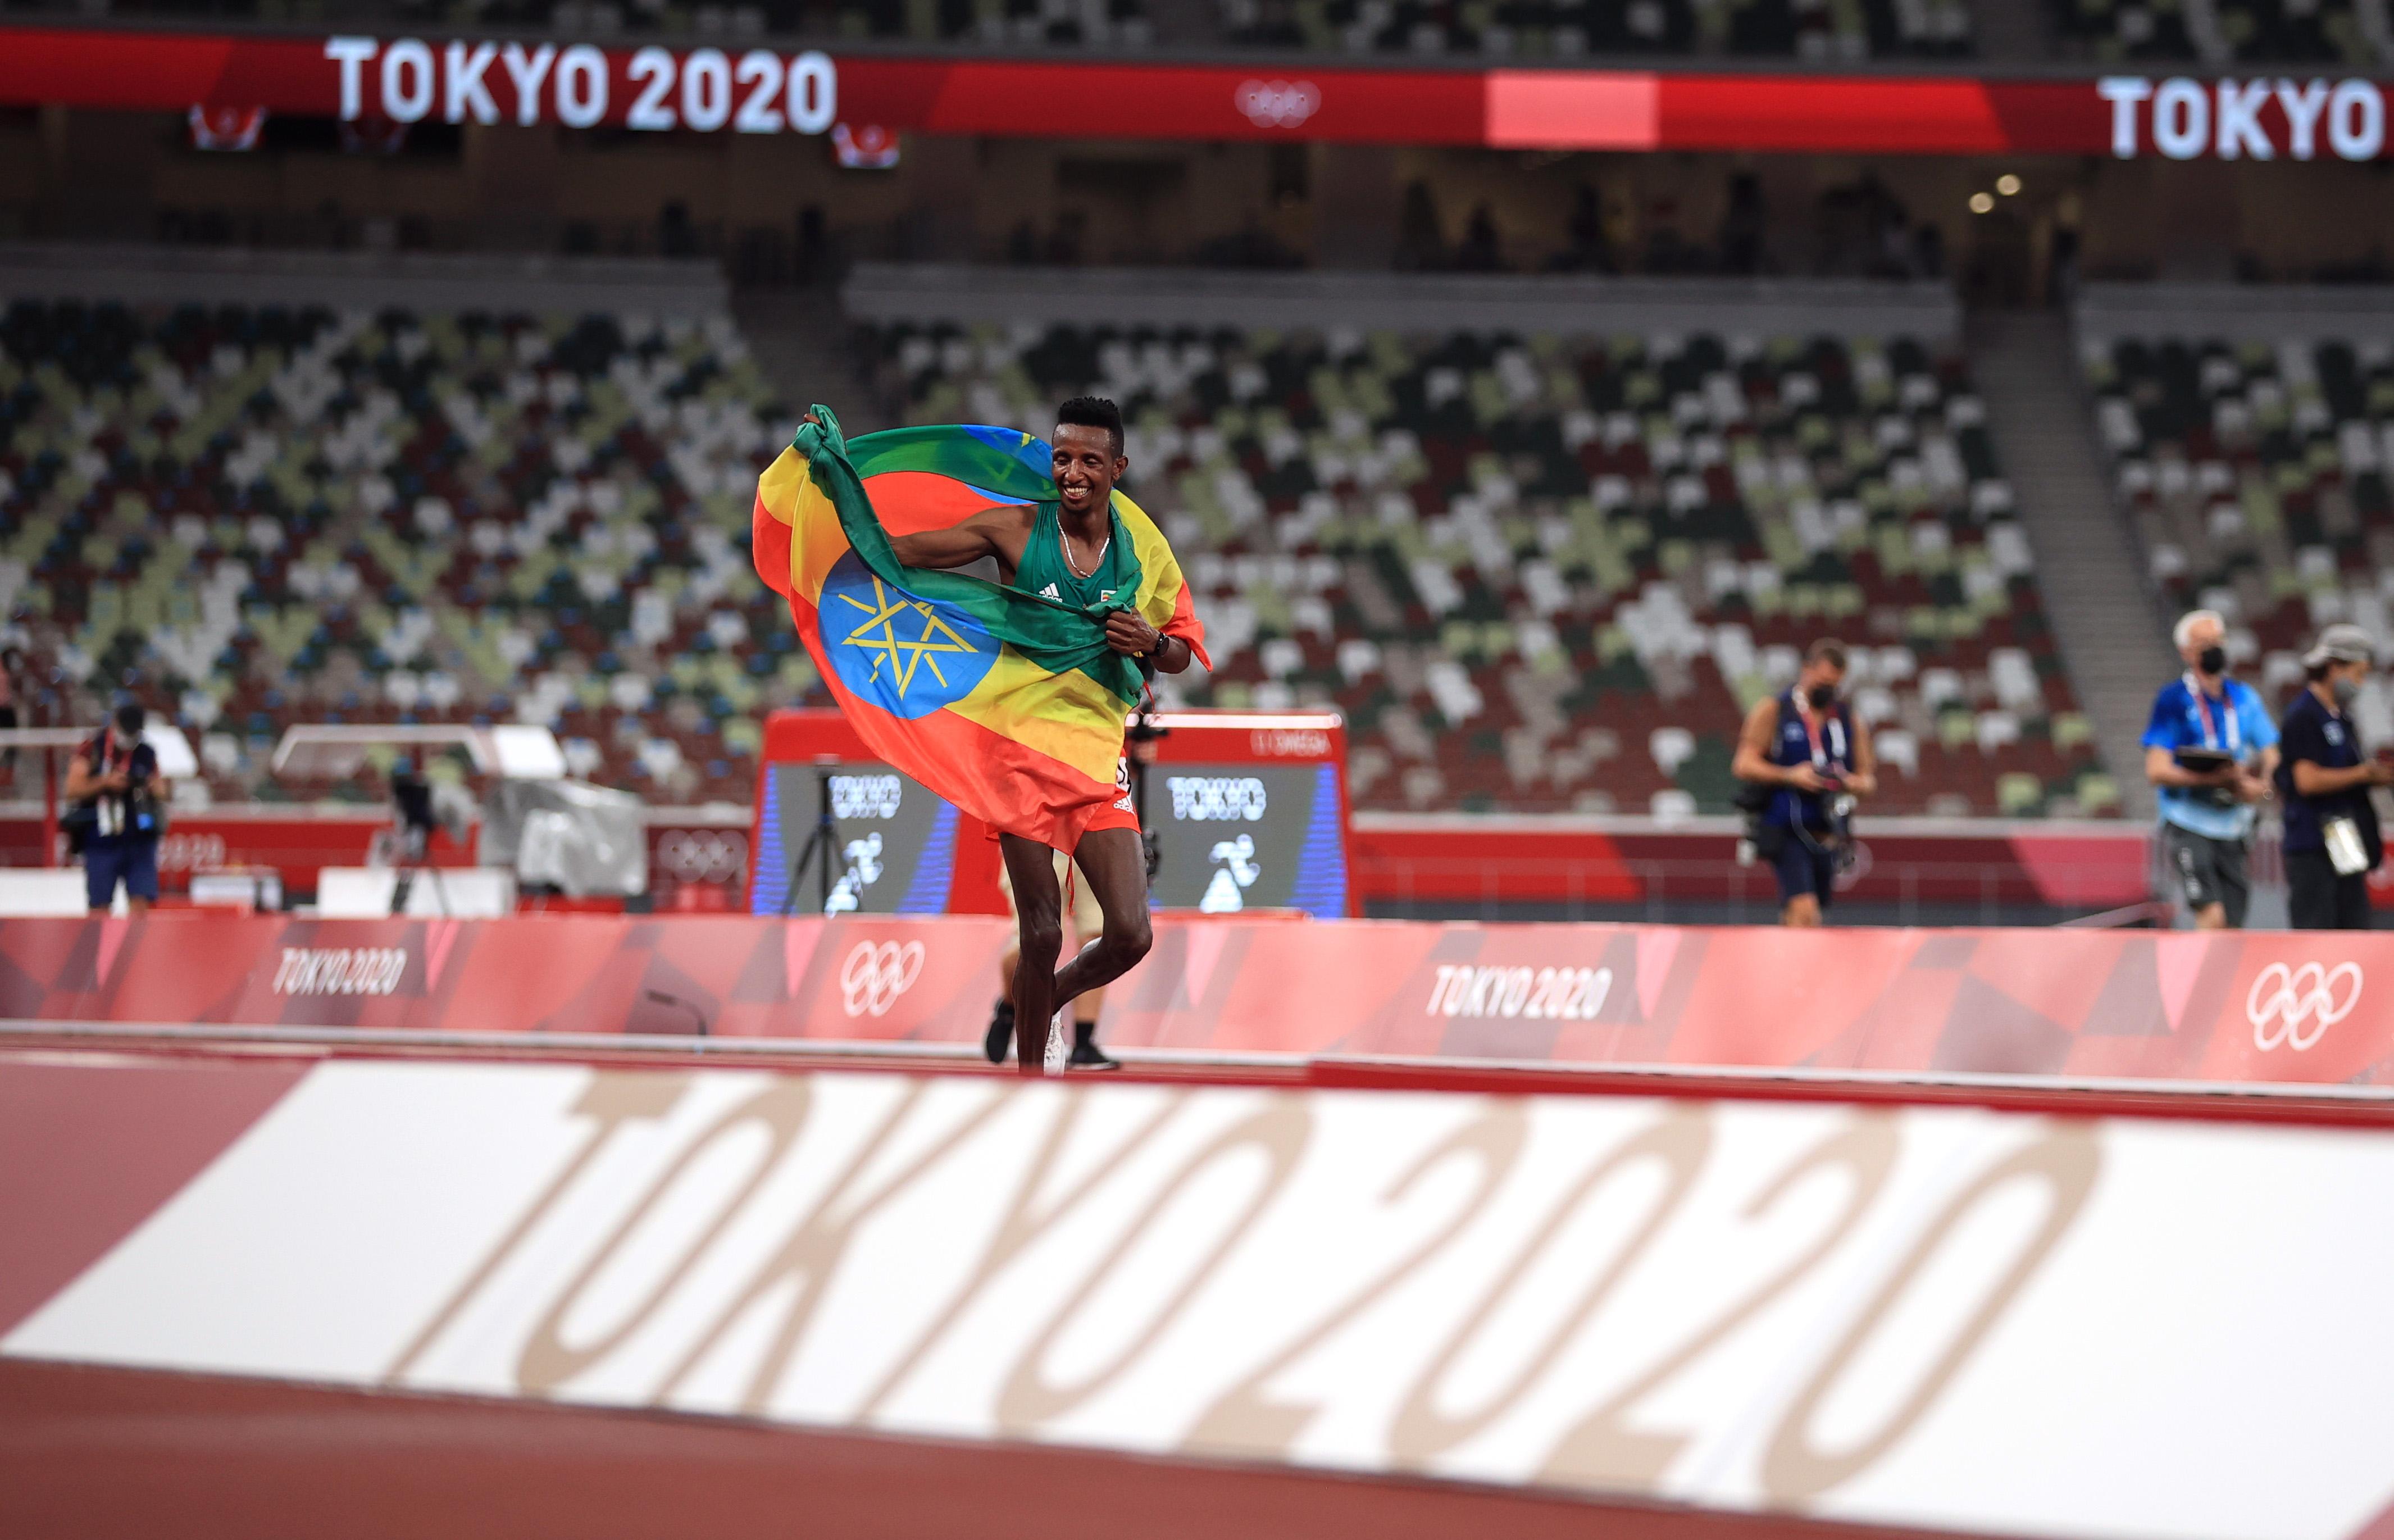 Tokyo 2020 Olympics - Athletics - Men's 10000m - OLS - Olympic Stadium, Tokyo, Japan - July 30, 2021. Selemon Barega of Ethiopia celebrates after winning gold REUTERS/Hannah Mckay